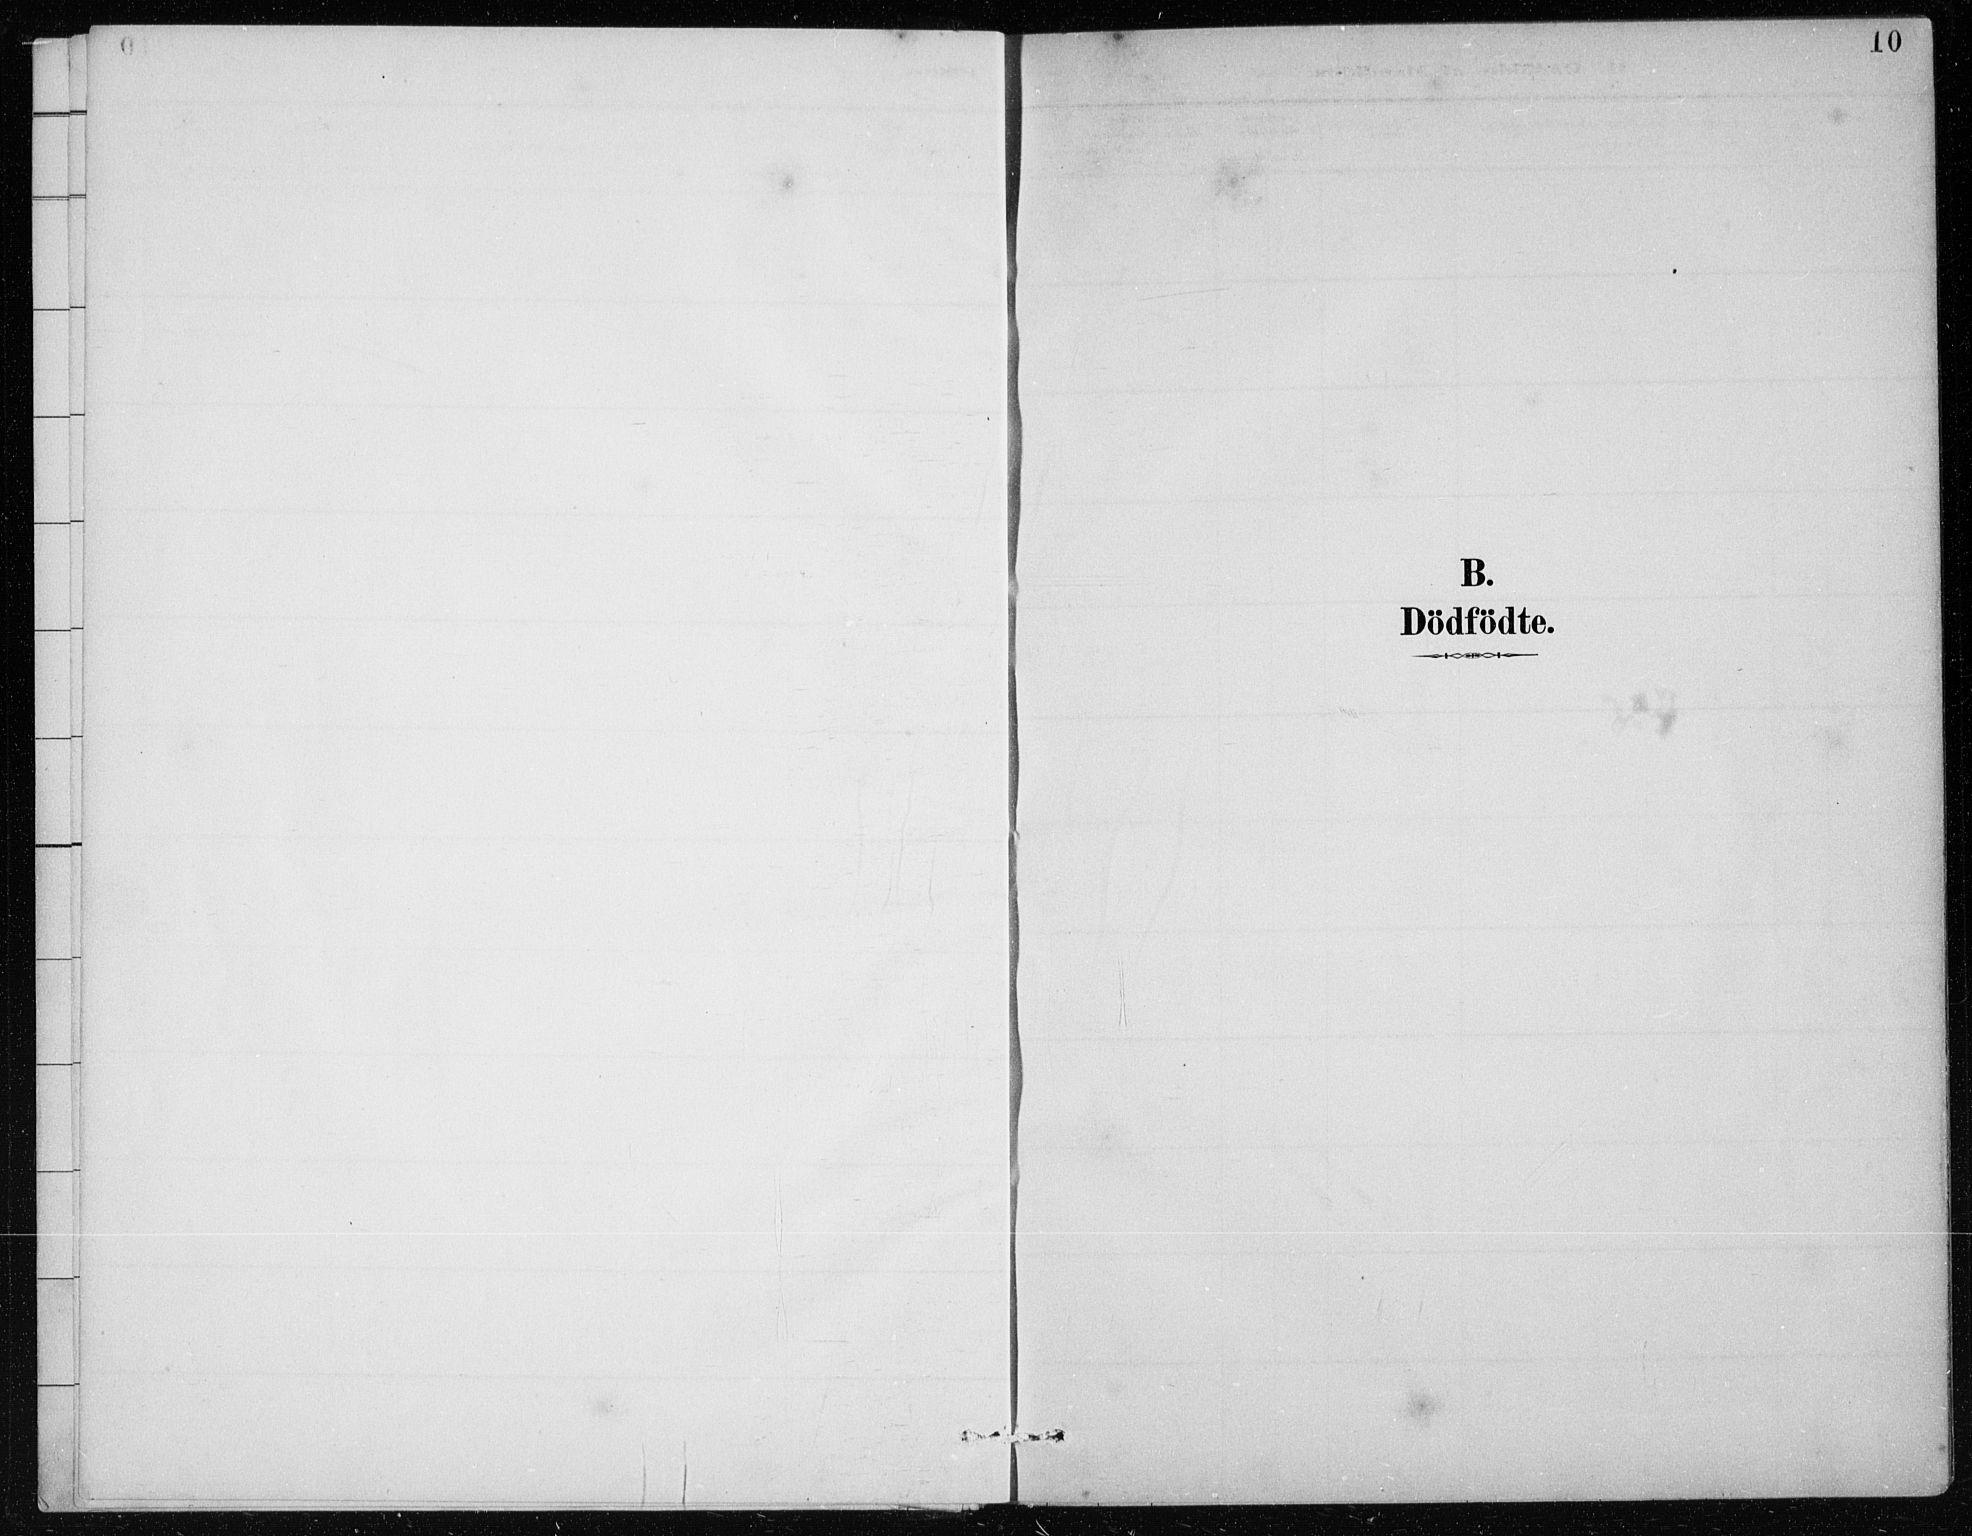 SAB, St. Jørgens hospital og Årstad sokneprestembete, Klokkerbok nr. A 10, 1886-1910, s. 10